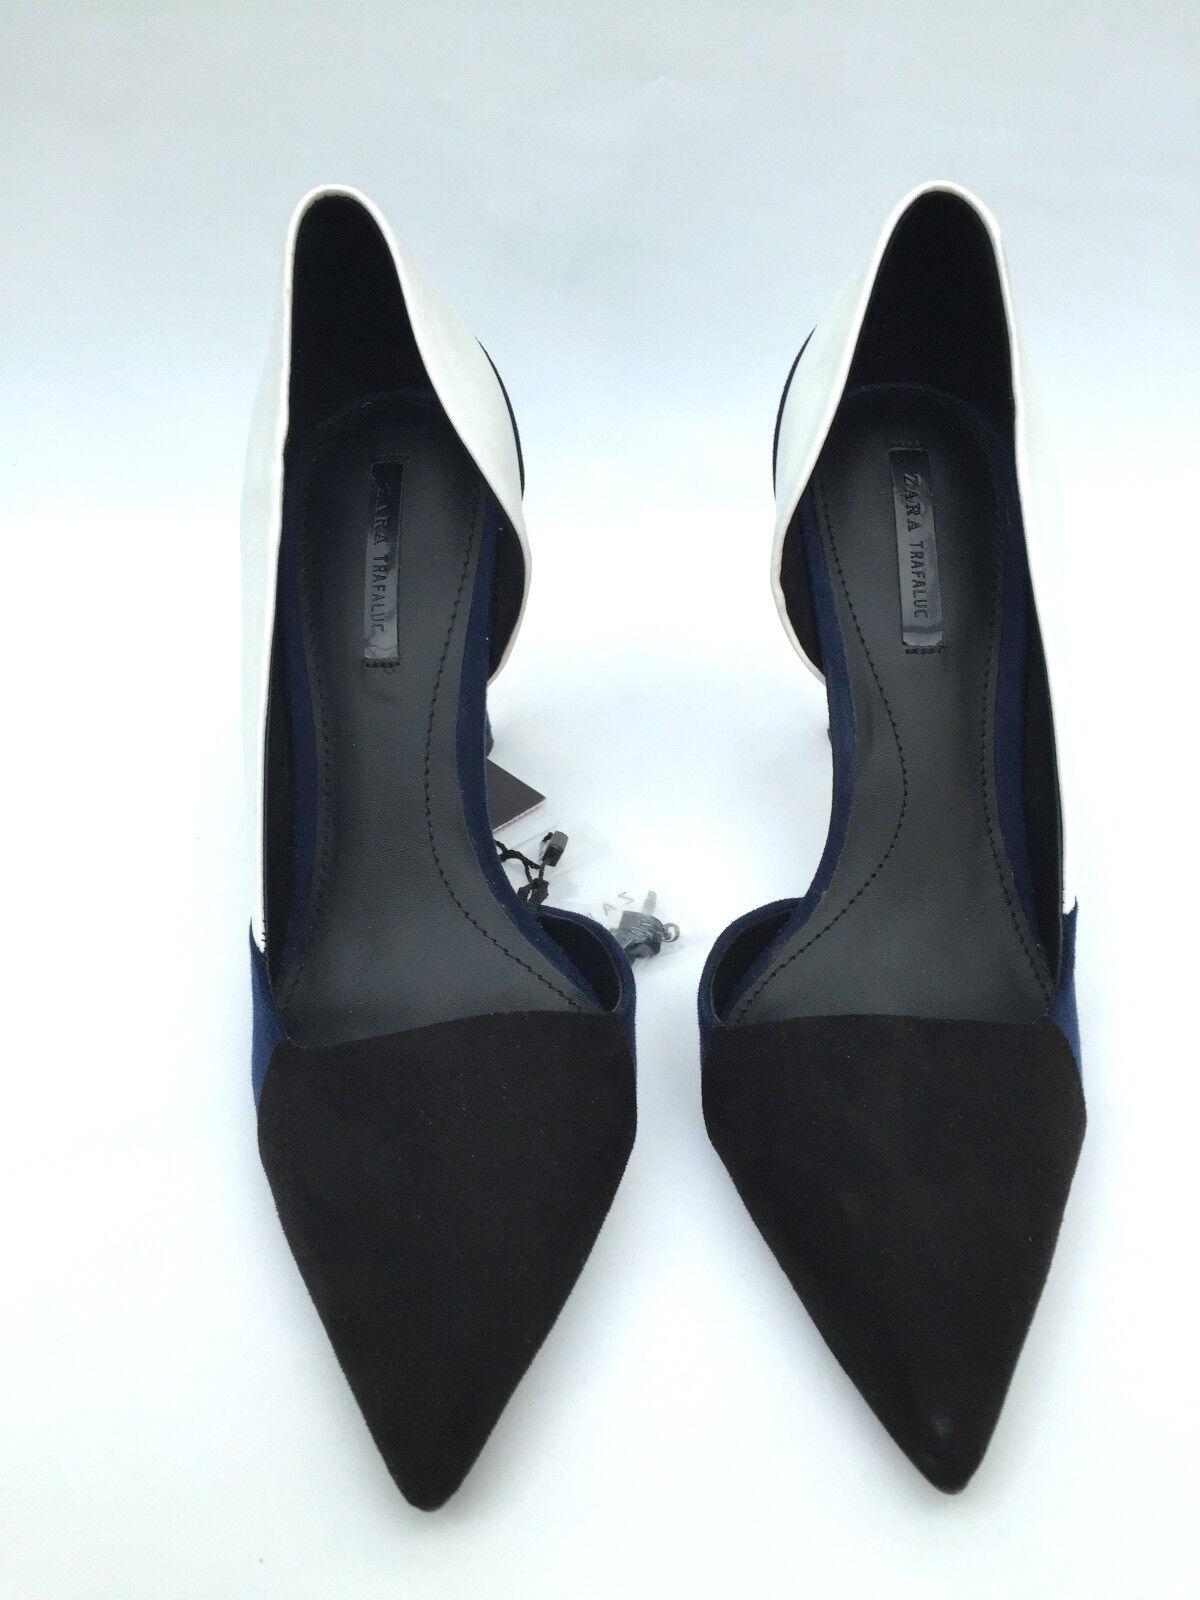 Zara Damen High Us7.5 Heels Pumps Größe UK5 EUR38 Us Us7.5 High eb669e